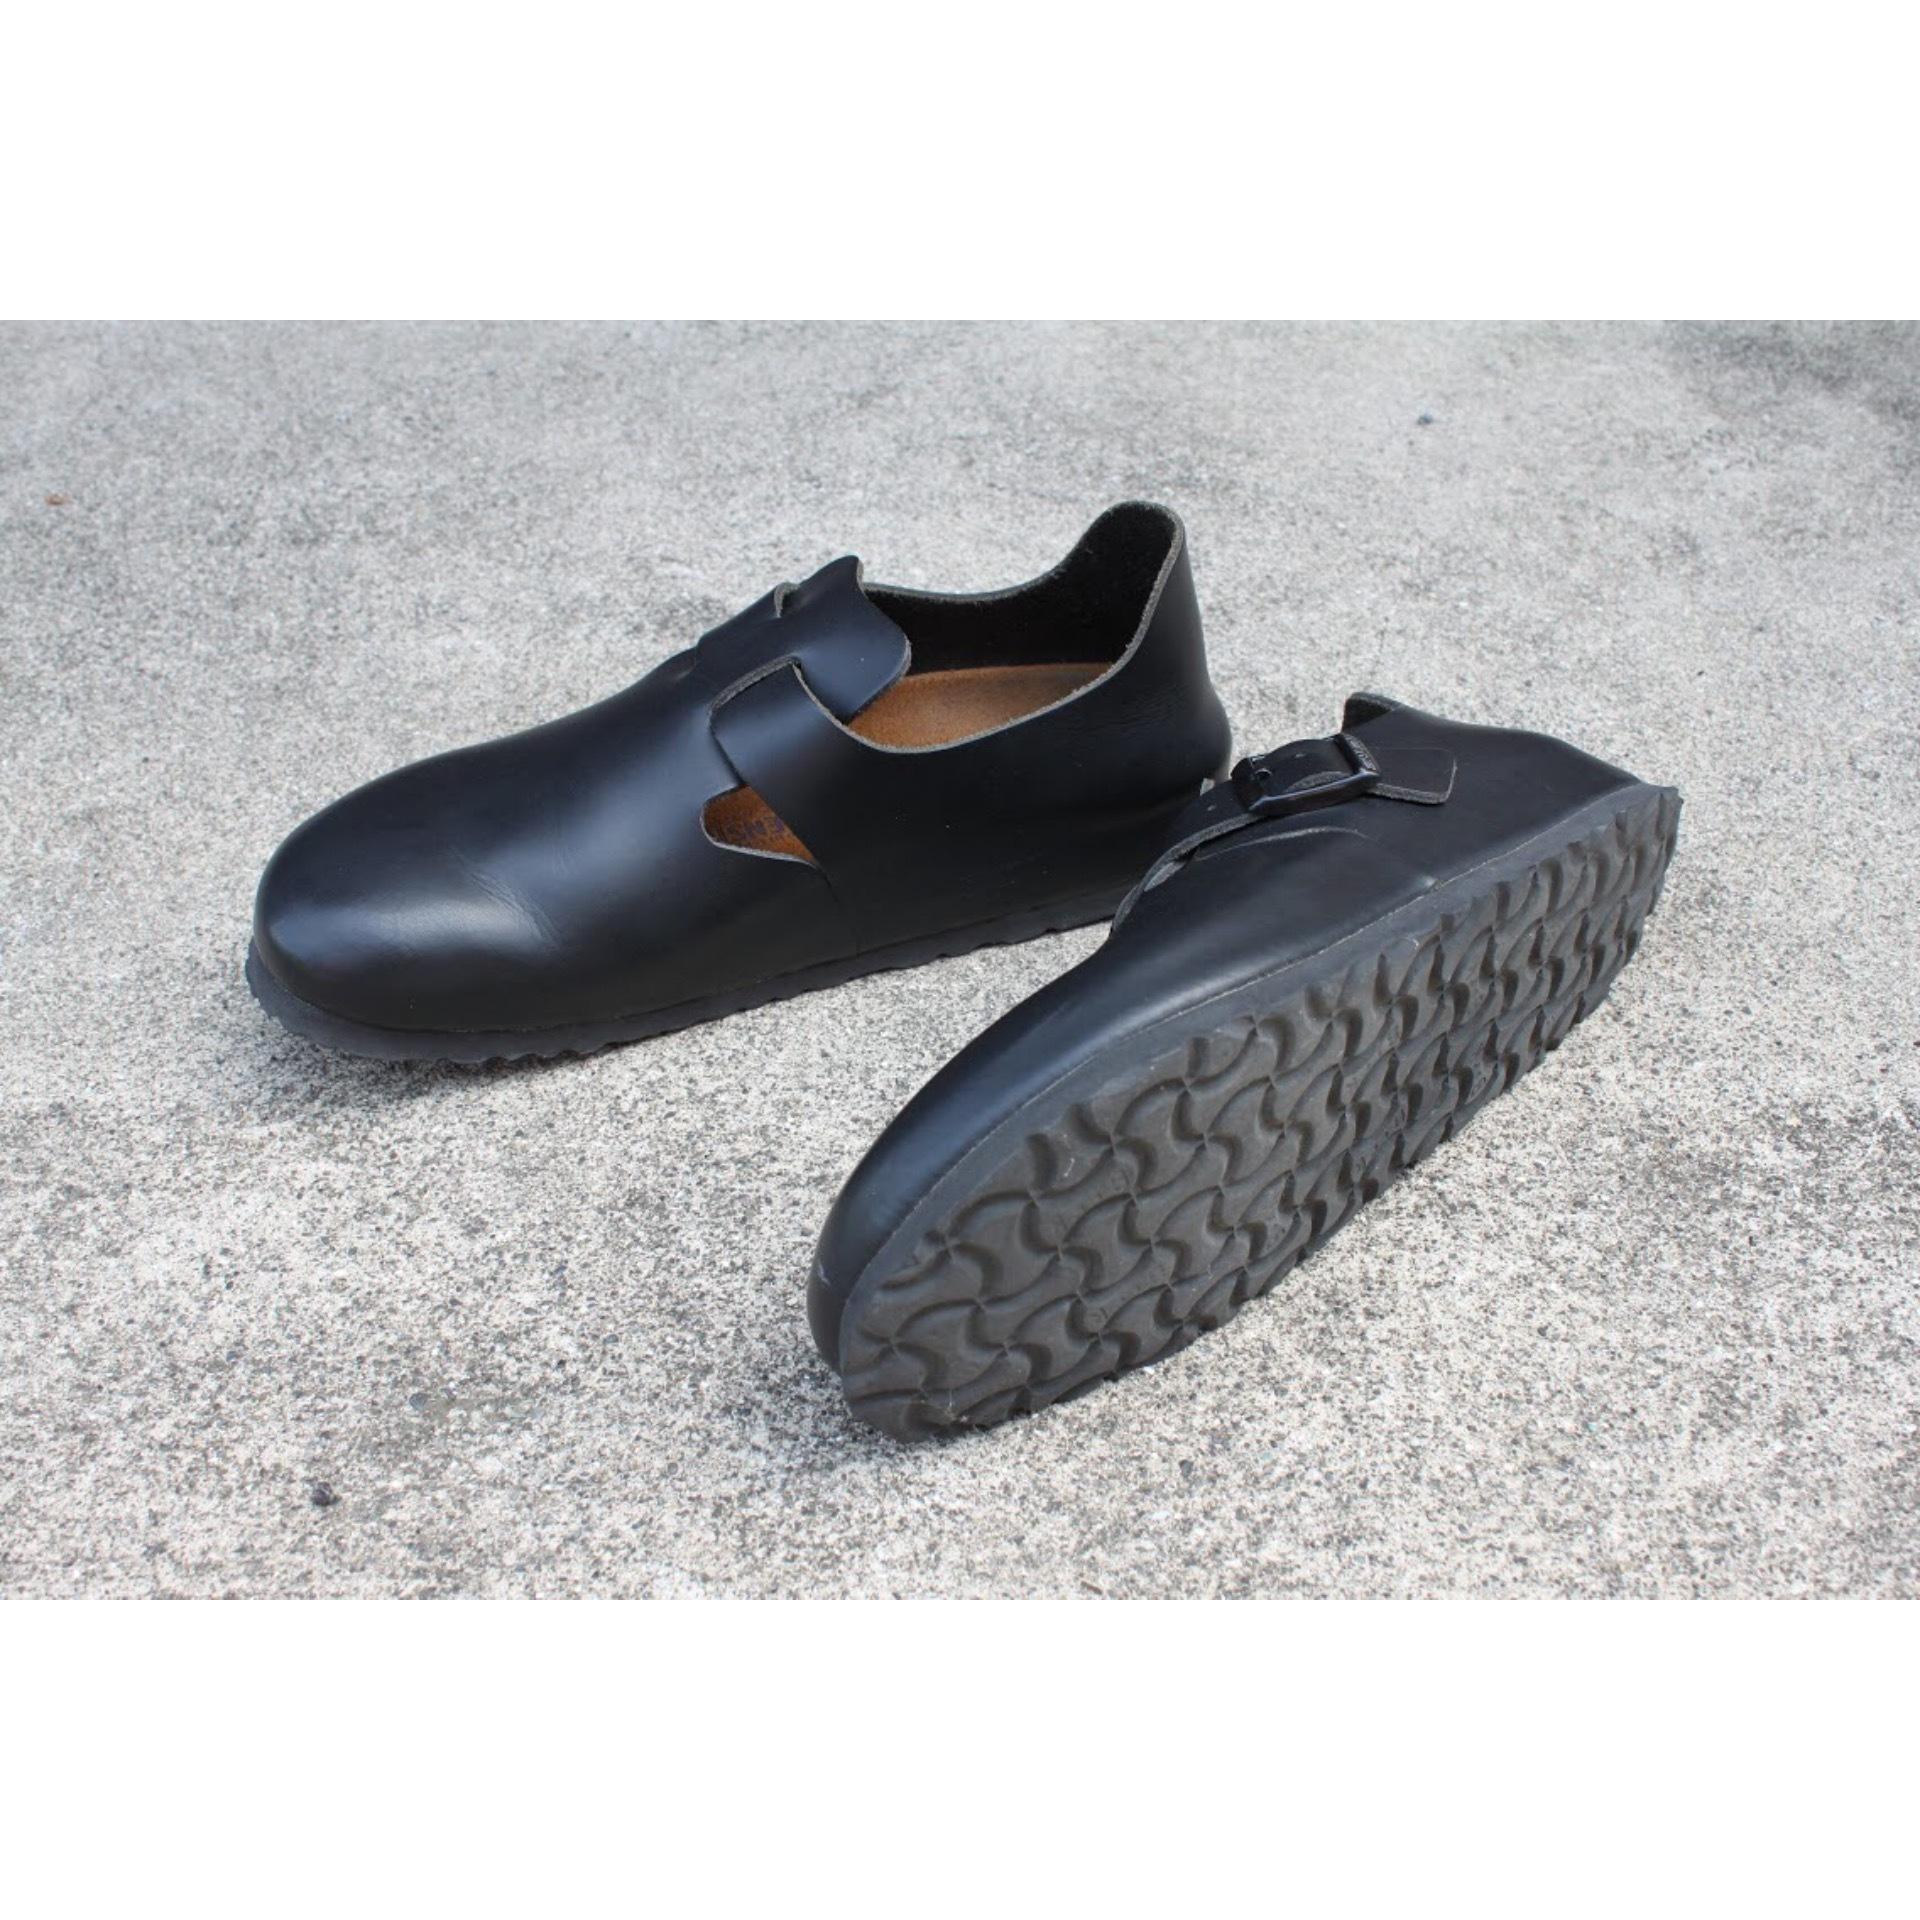 Vintage close-toe strap shoes by BIRKENSTOCK